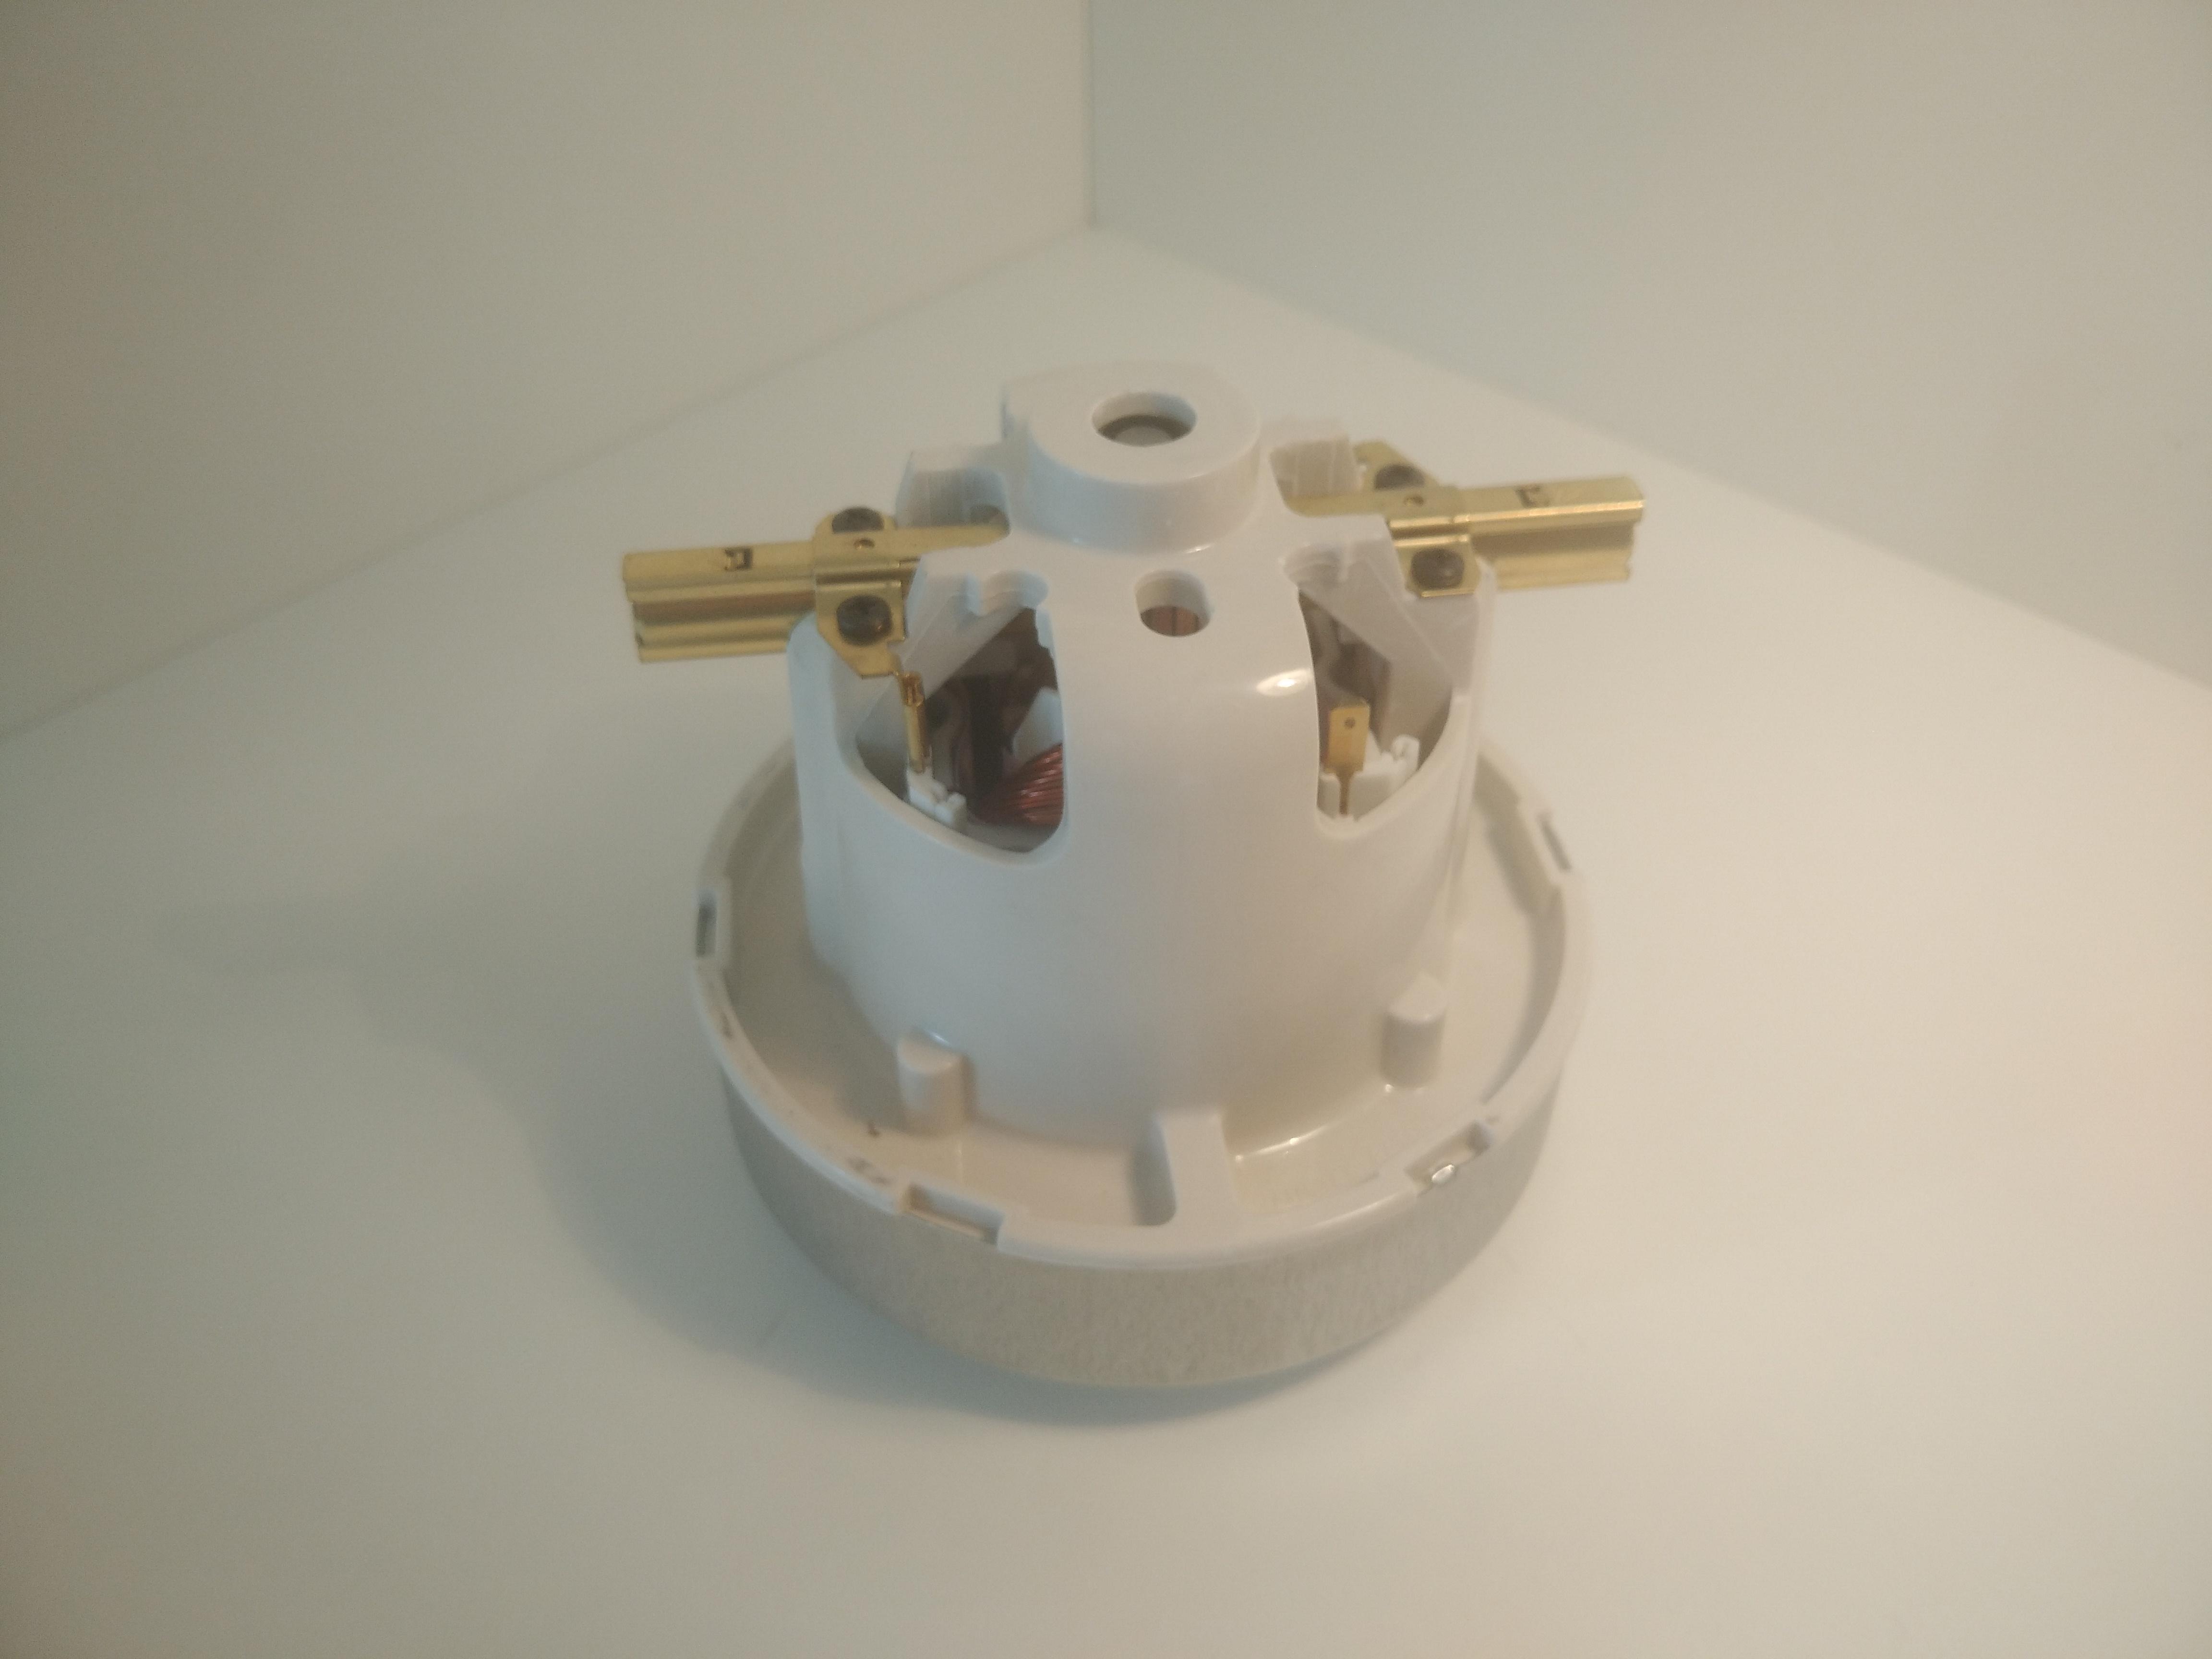 1m Alu-Titan Hitzeschutzschlauch ID 30mm Klettverschluss *** Heat Sleeve Thermoschutz Isolierschlauch Kabelschutz